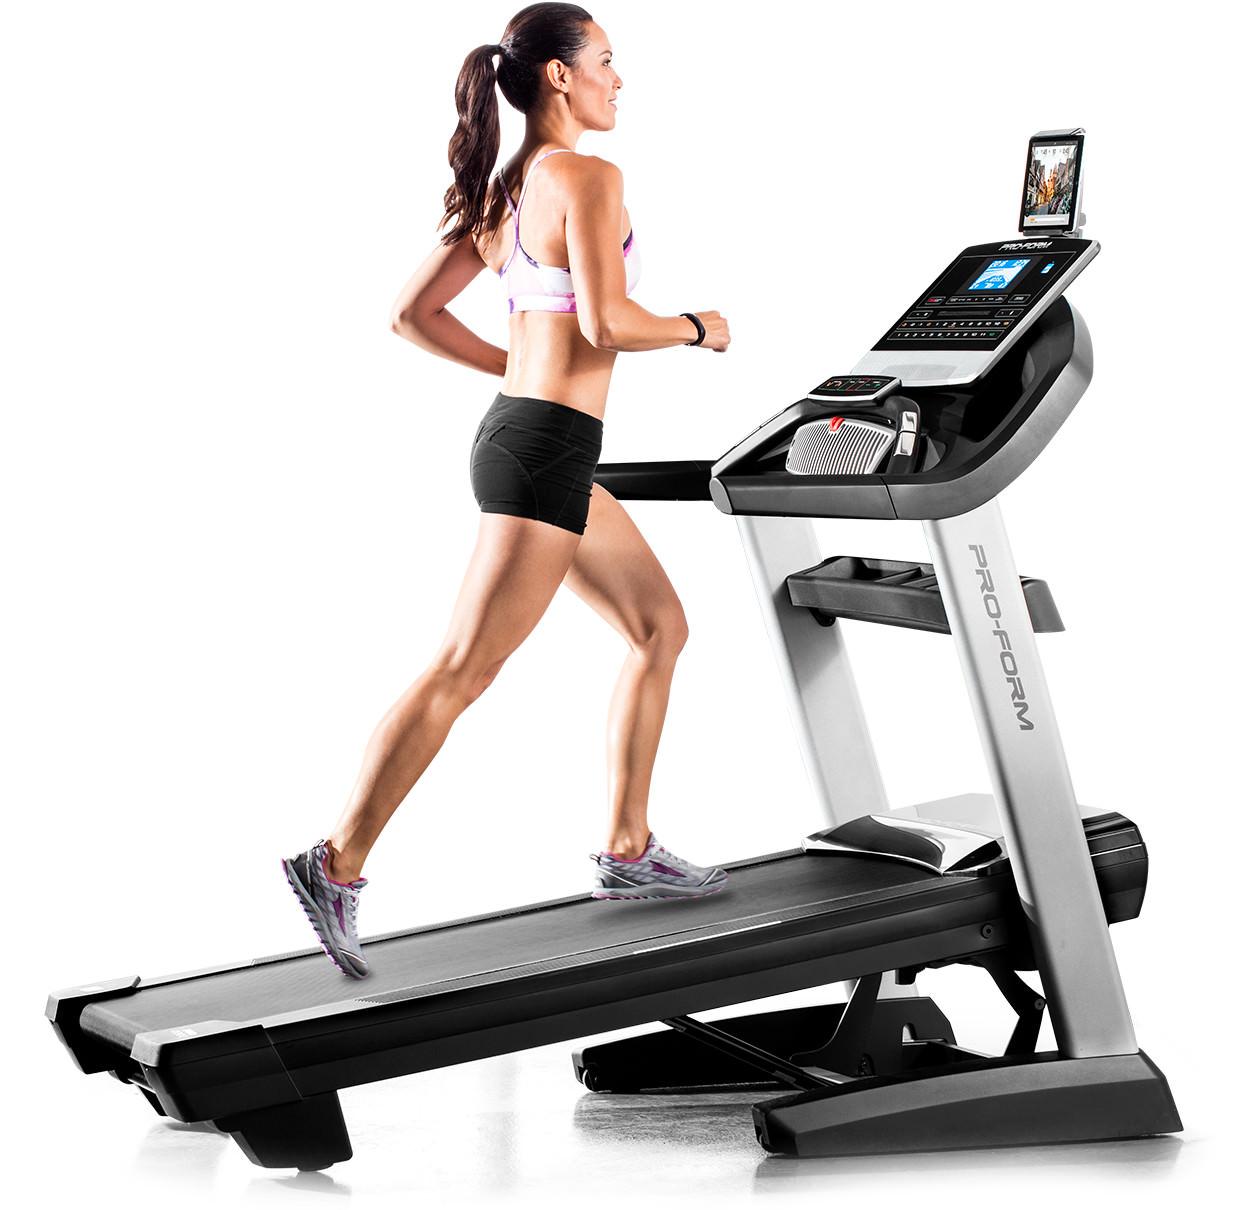 Workout Warehouse Treadmills ProForm Pro 2000